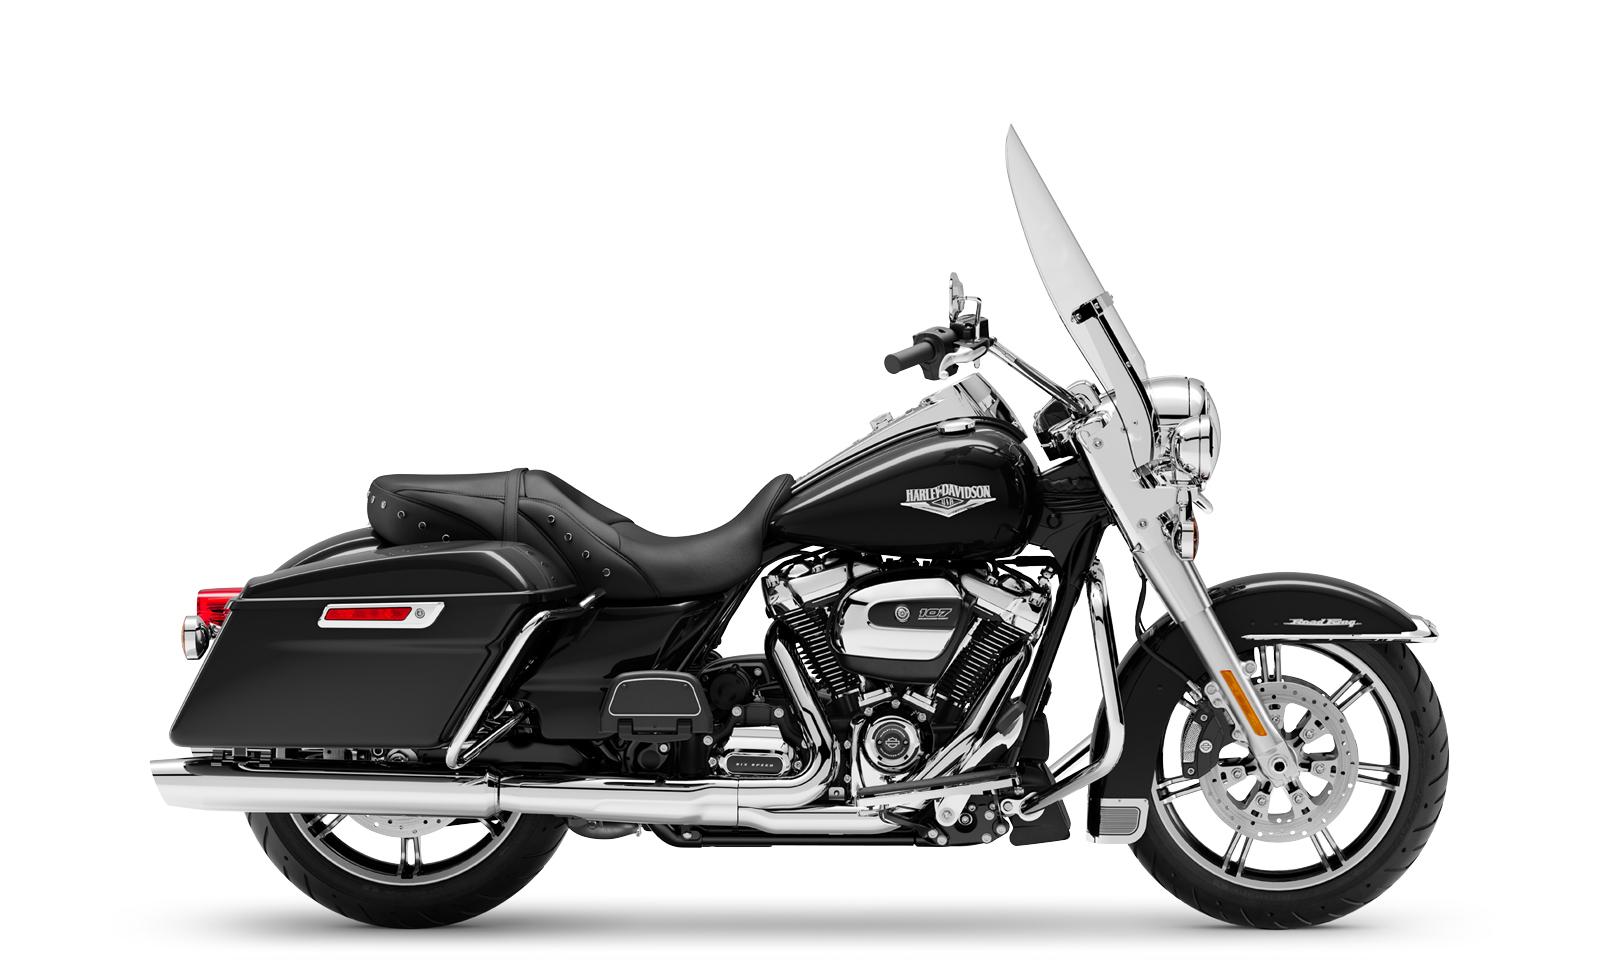 2020 Road King Motorcycle   Harley-Davidson Greece/Cyprus